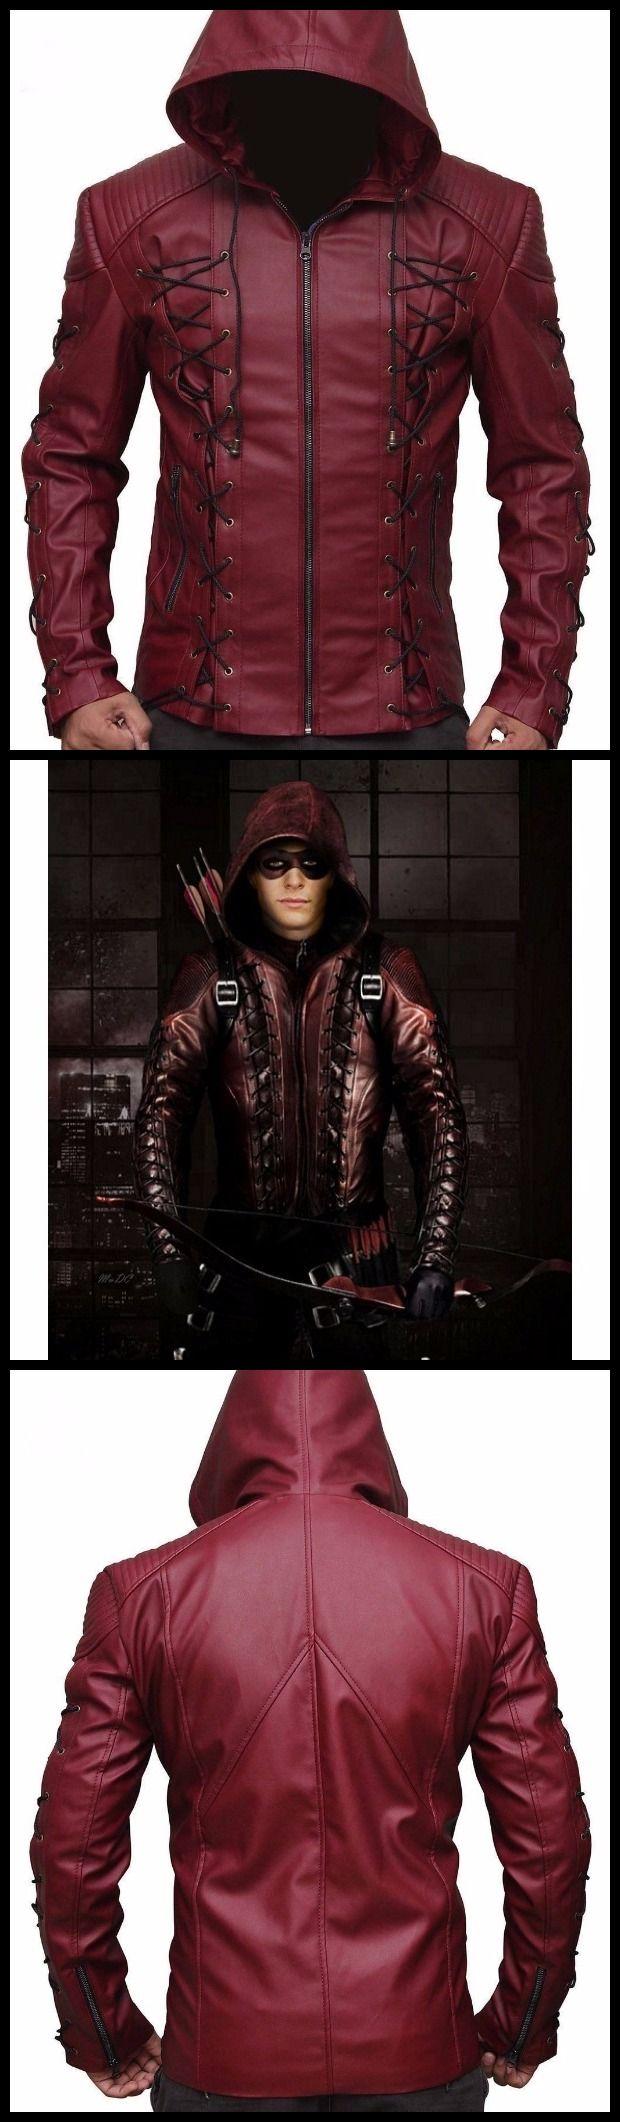 Arrow arsenal season 3 roy harper colton haynes hooded maroon leather jacket